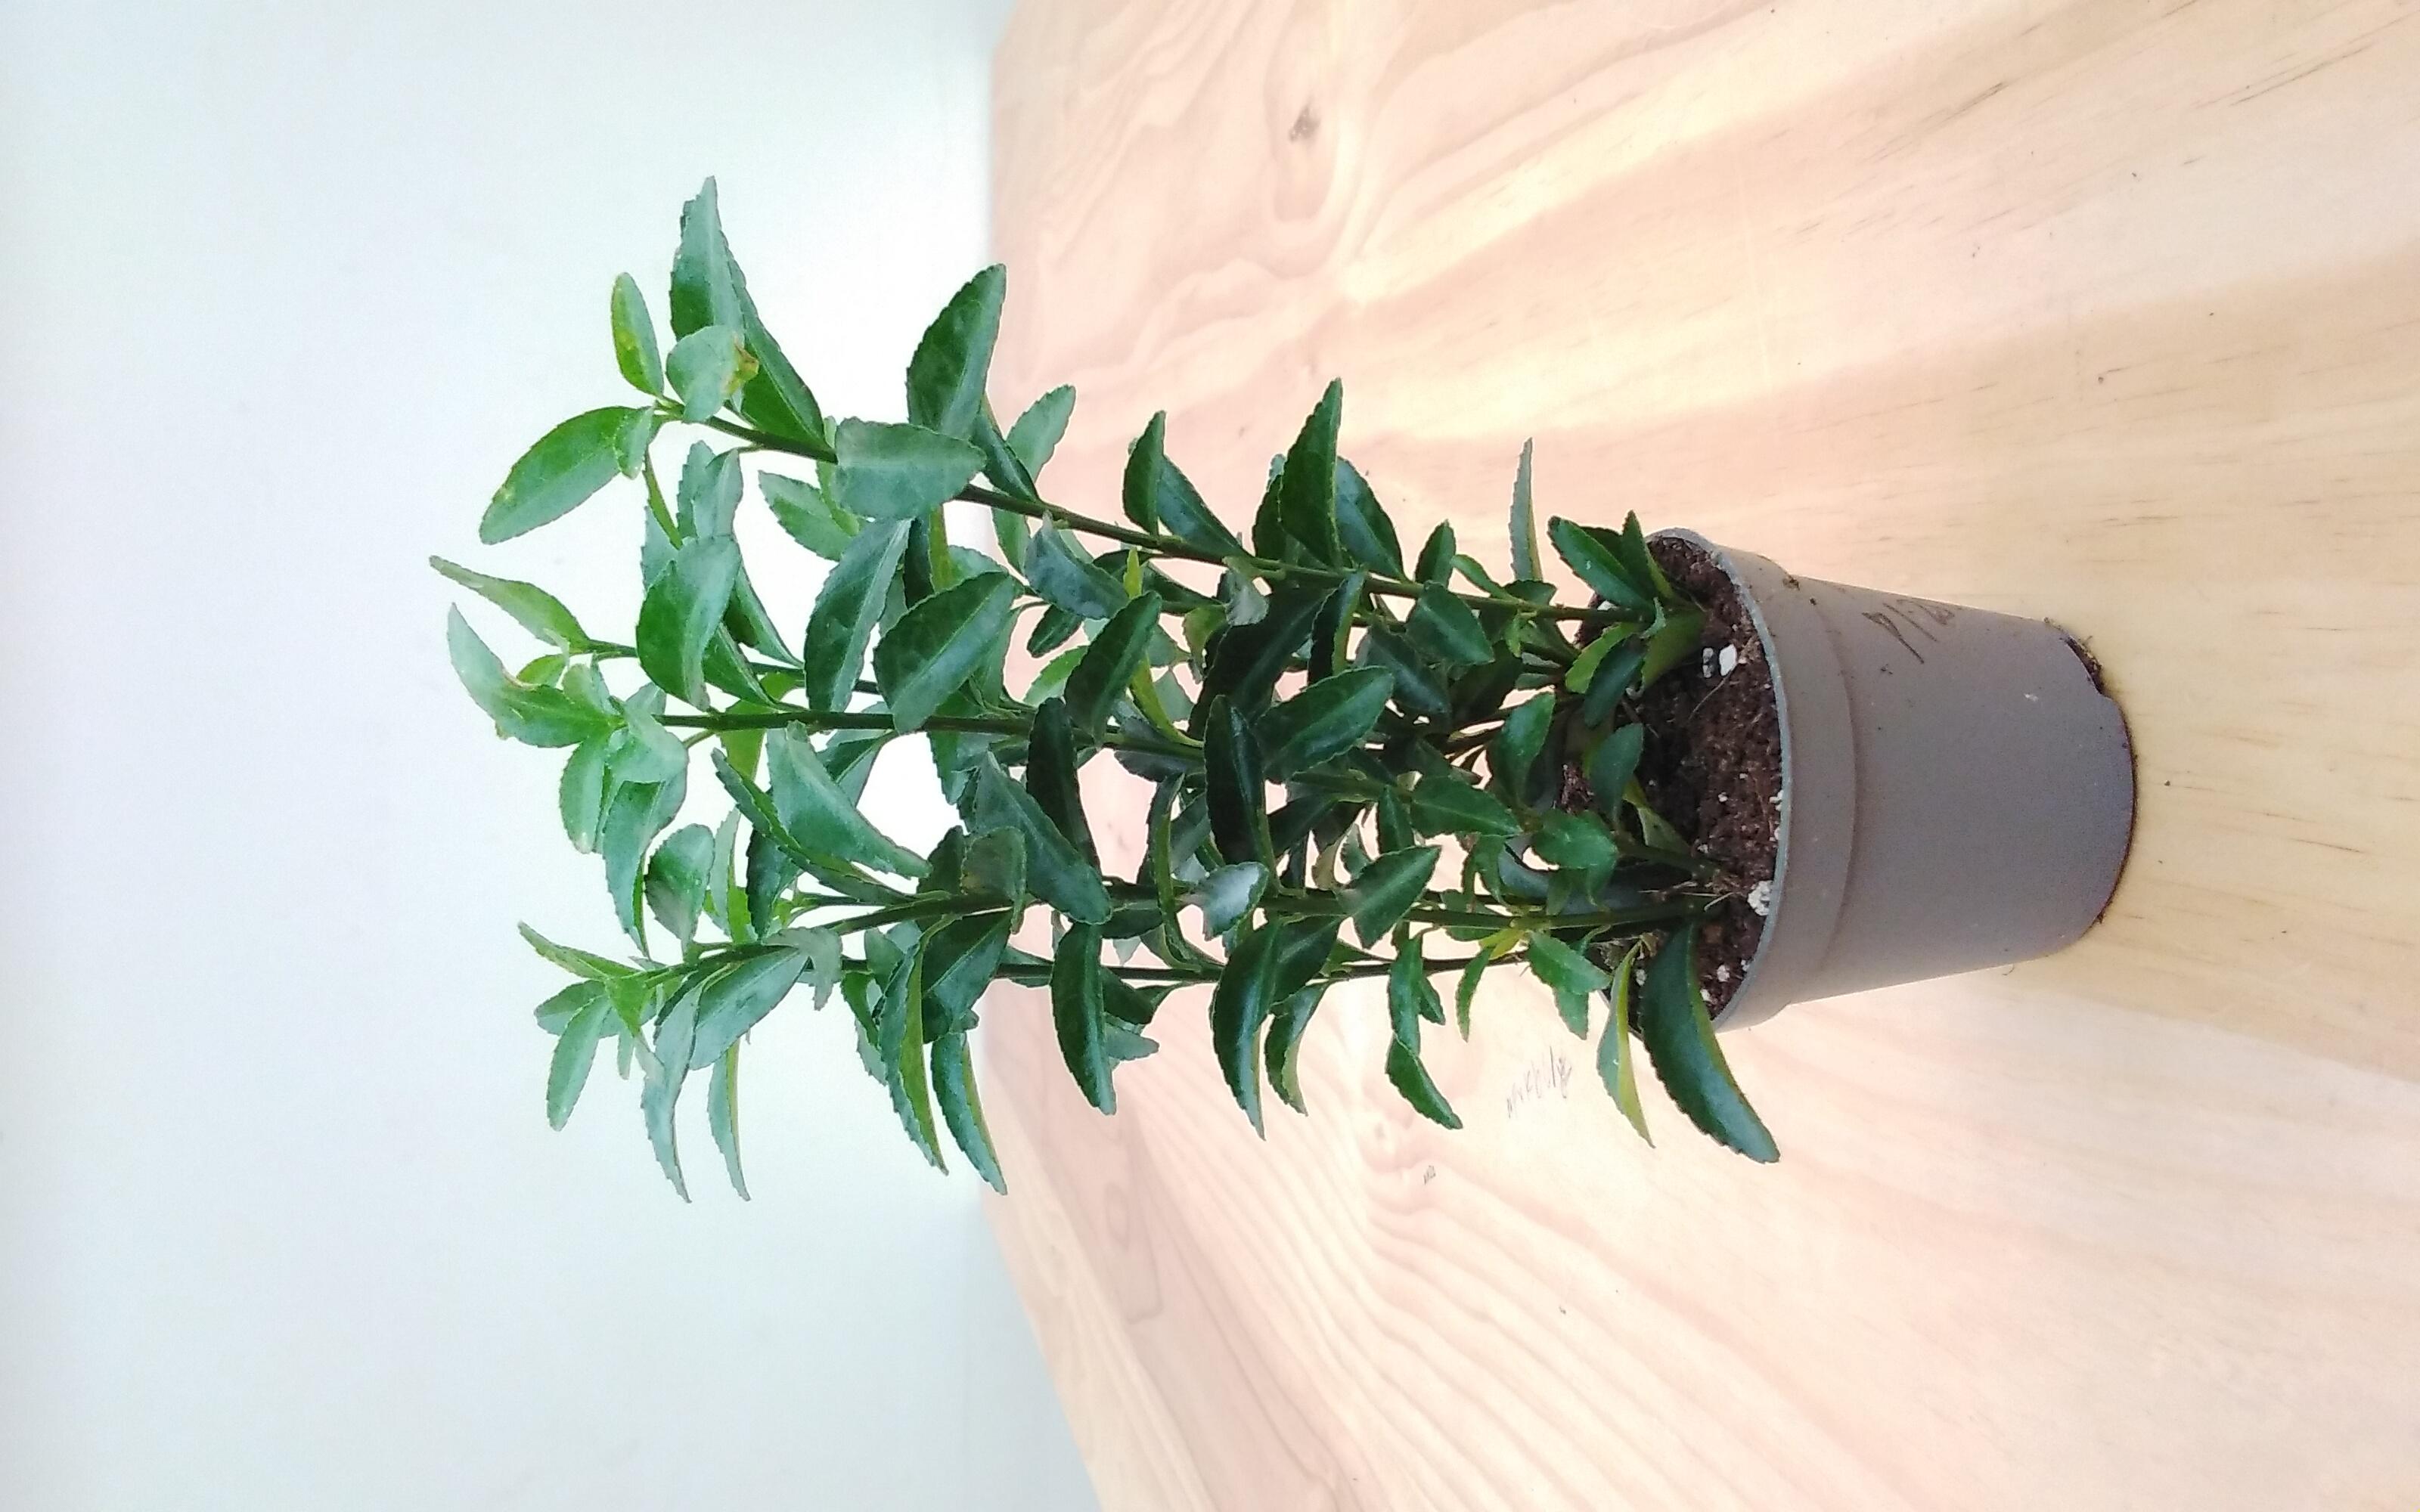 Euonymus Jap. Mixed Green Indoor Plants